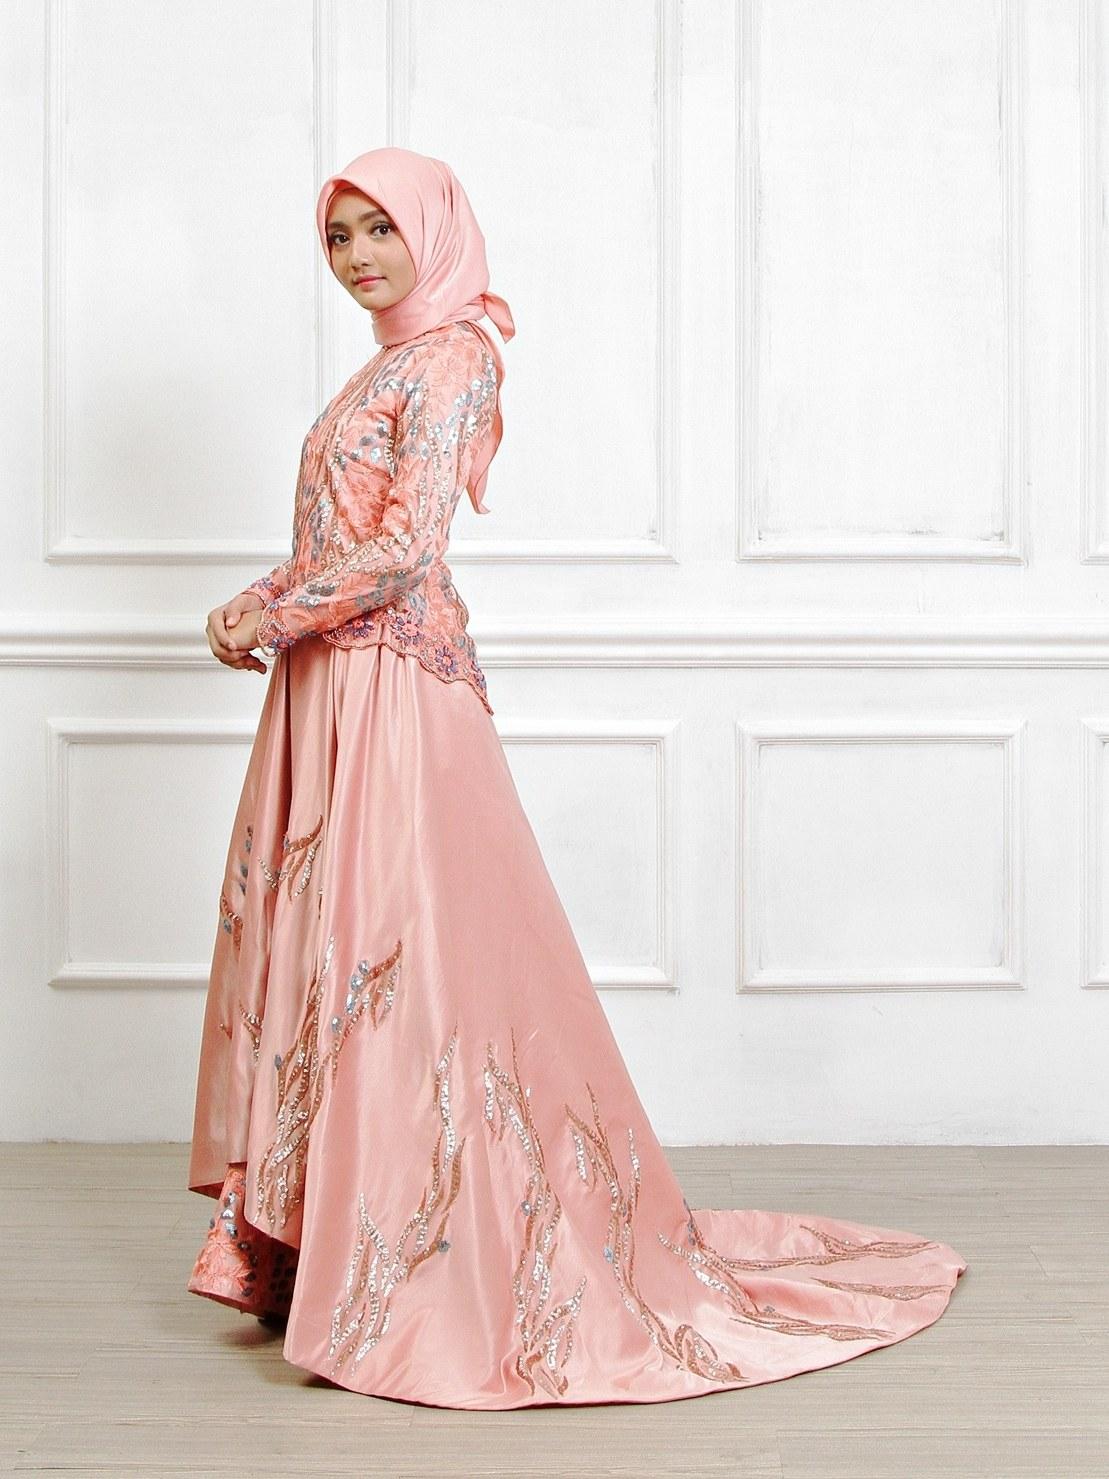 Bentuk Sewa Gaun Pengantin Muslimah Di Bekasi H9d9 Gaun Pengantin Muslimah Dress Muslim Pungky Rumah Jahit